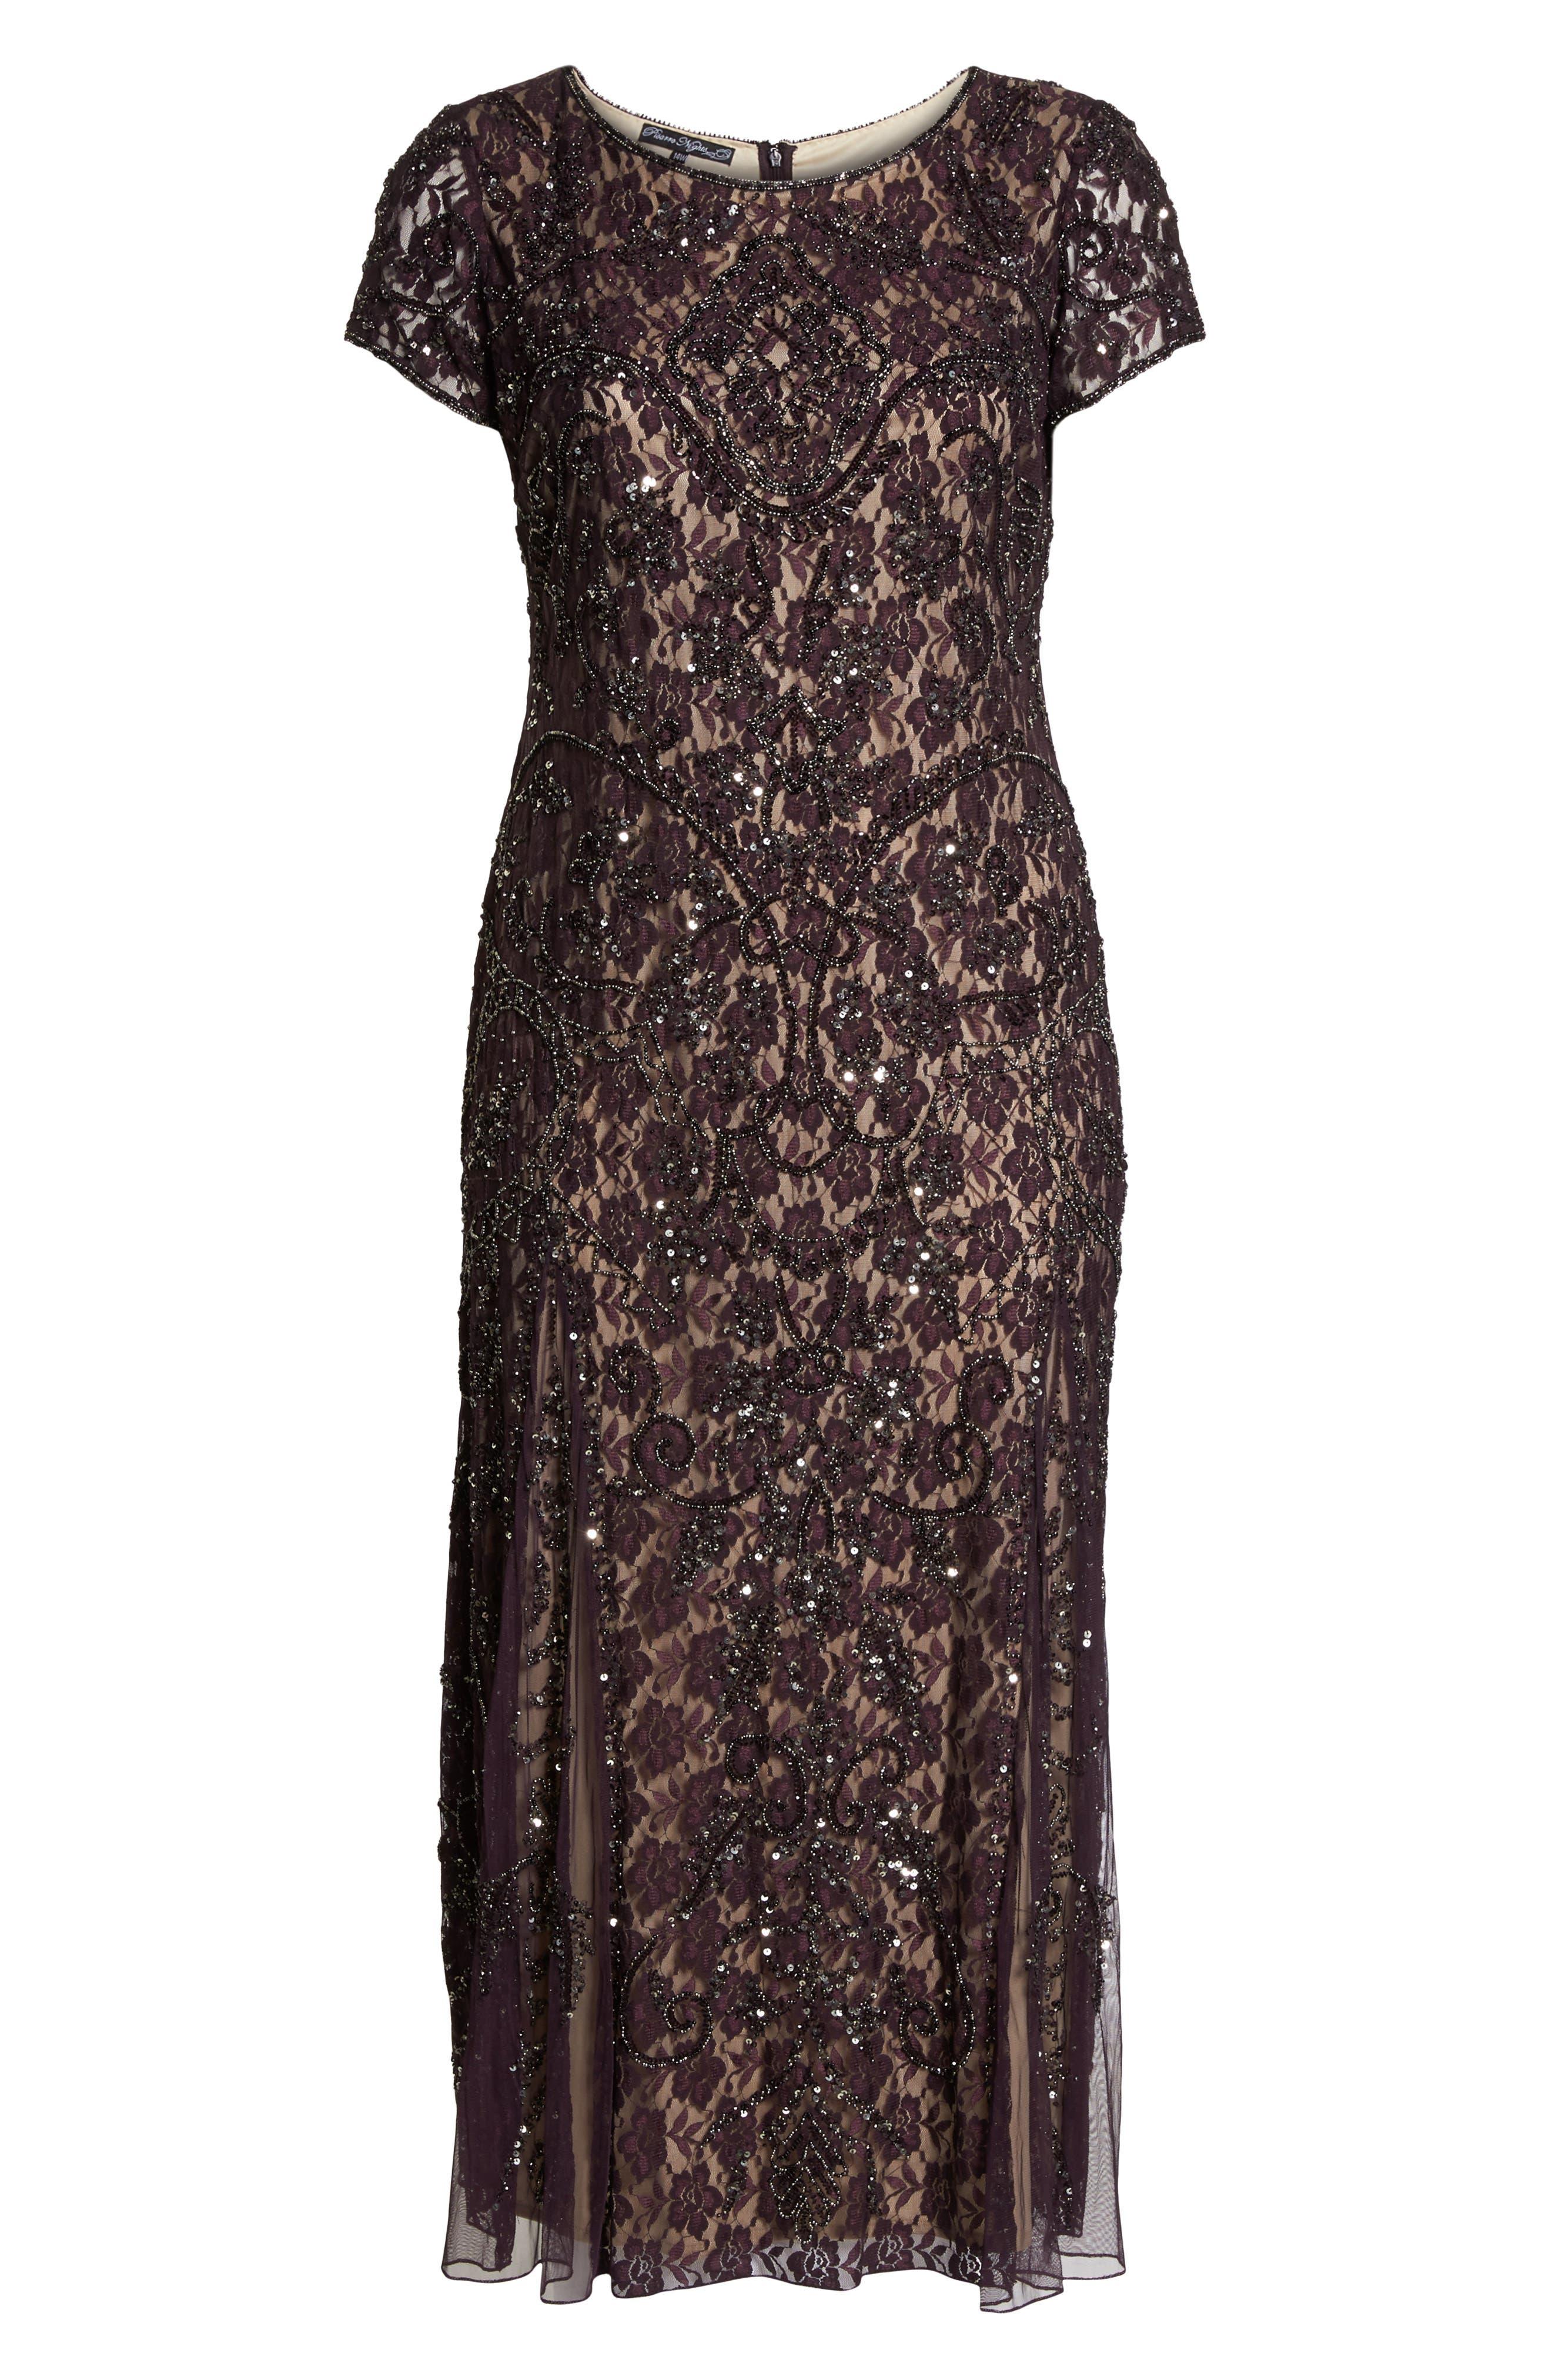 Embellished Lace A-Line Dress,                             Alternate thumbnail 6, color,                             Plum